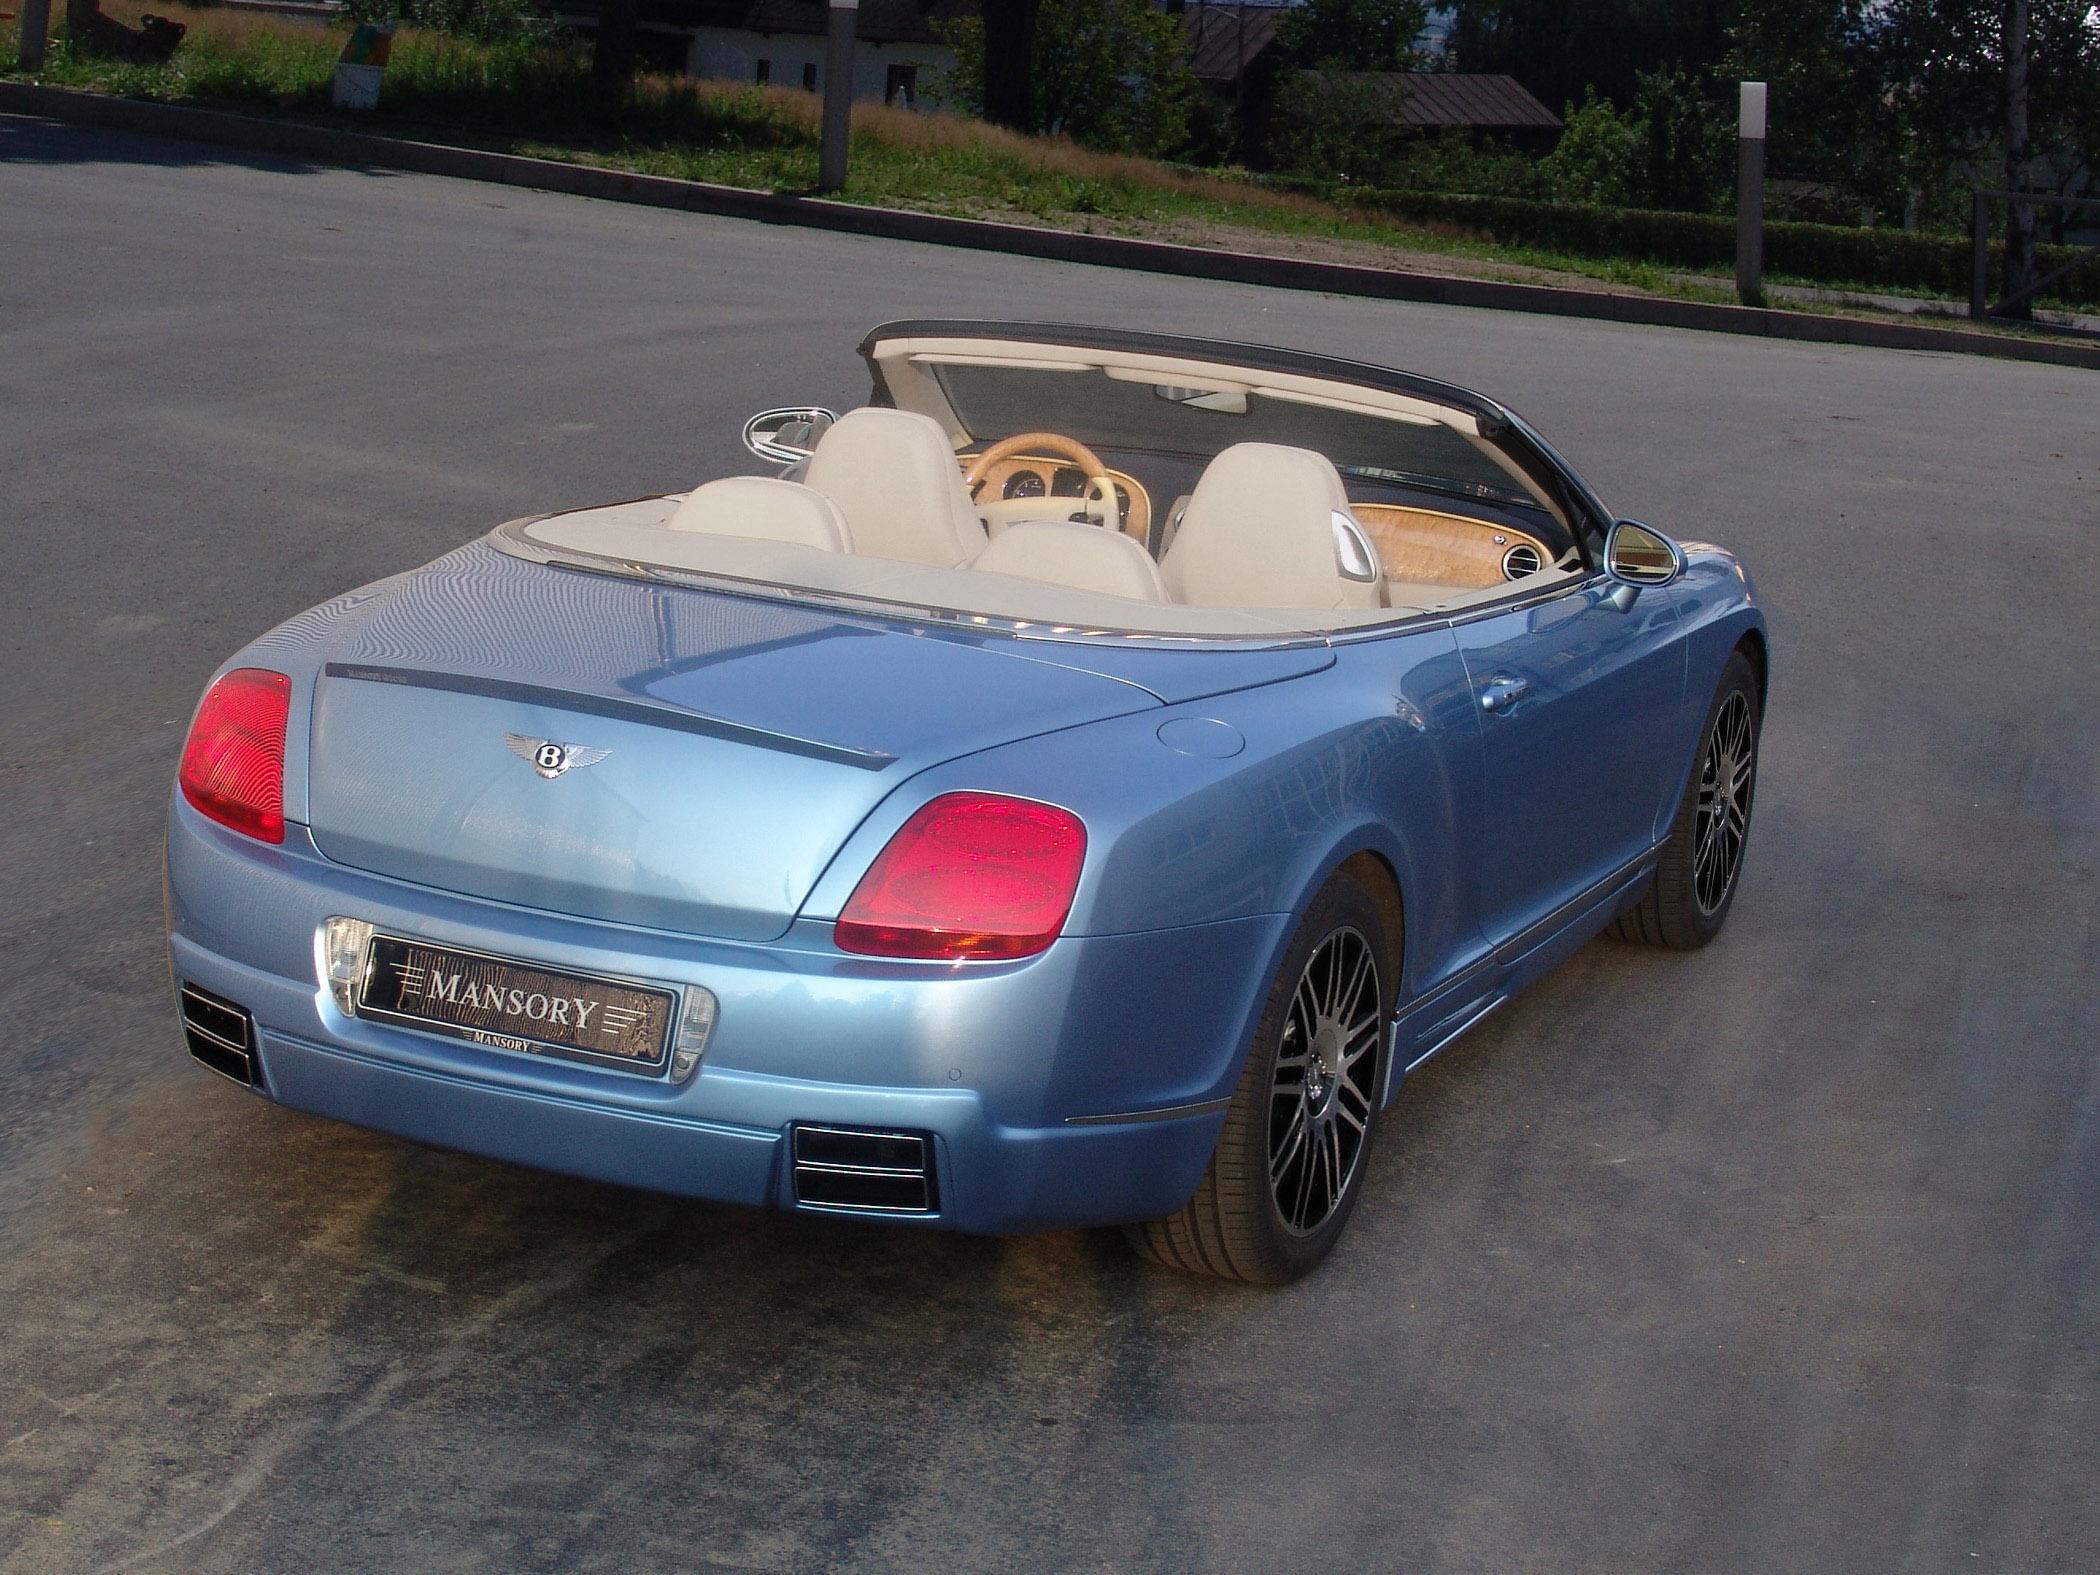 Lamborghini aventador j revealed 2005 mansory bentley continental gt vanachro Gallery